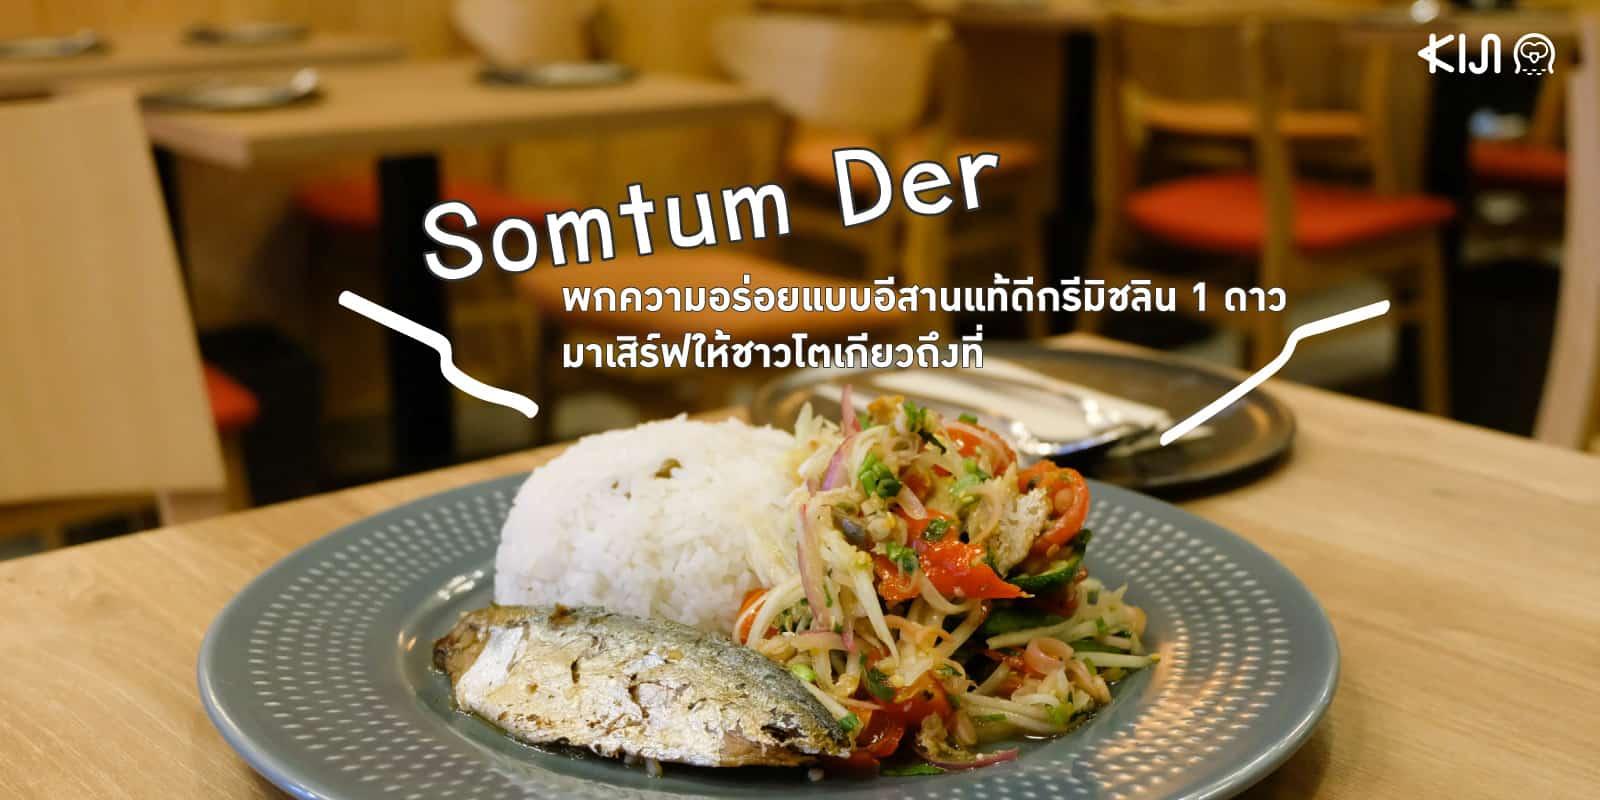 Somtum Der ส้มตำเด้อ ร้านอาหารอีสานดีกรีมิชลิน 1 ดาวในโตเกียว